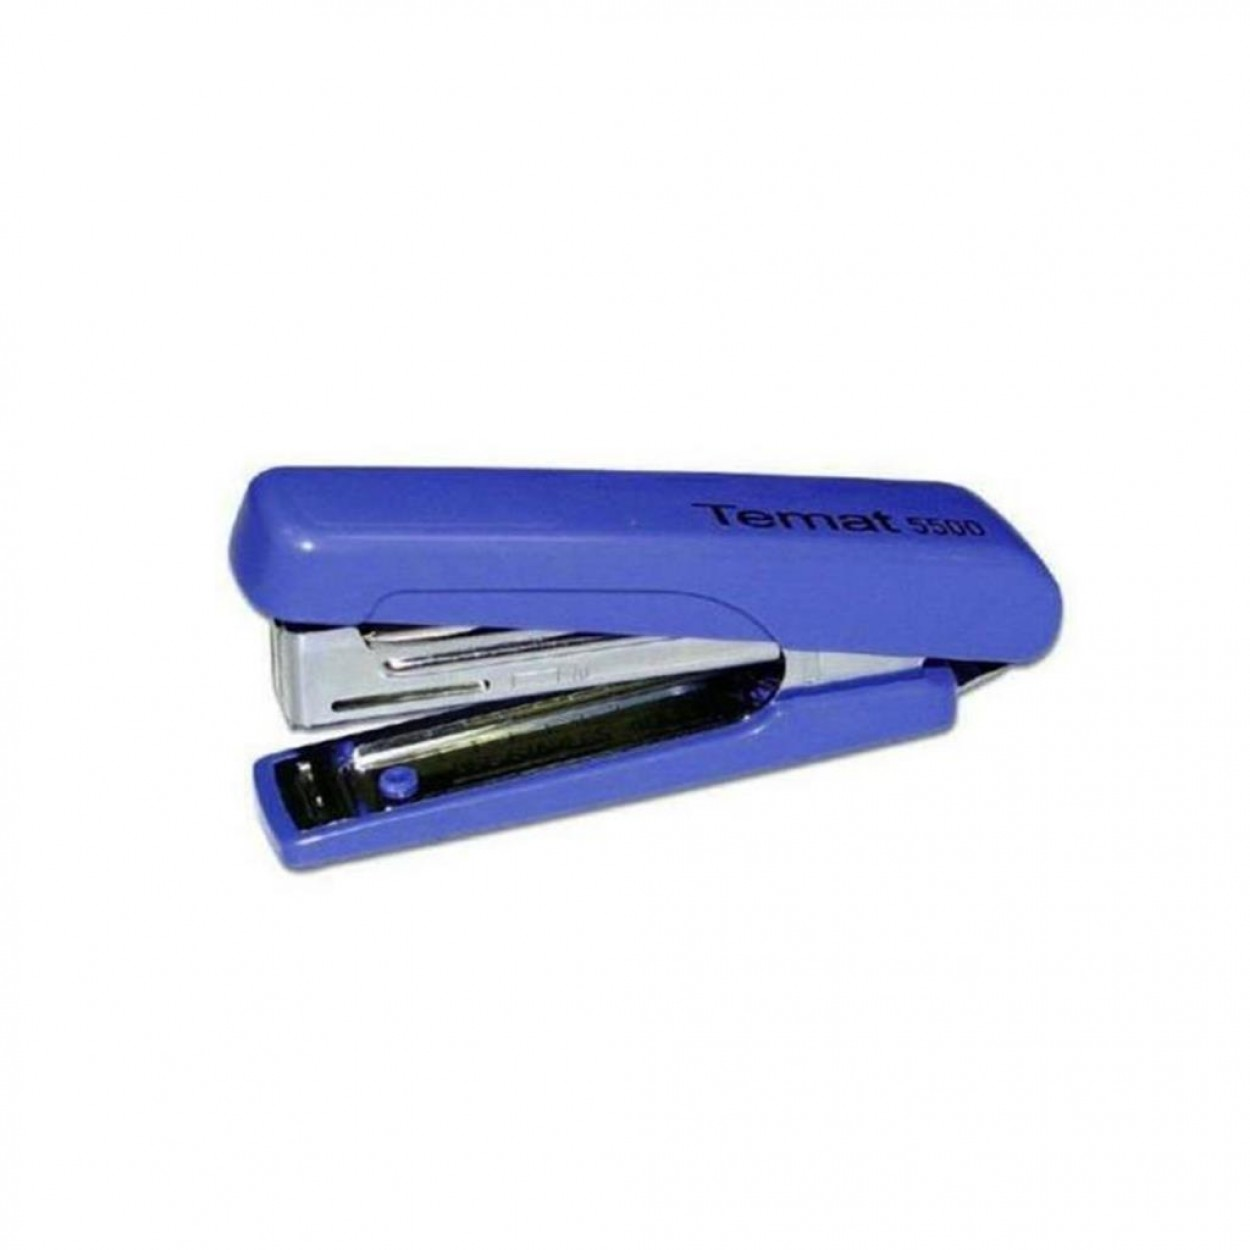 Temat 5500 Zımba Makinesi Mavi Renk